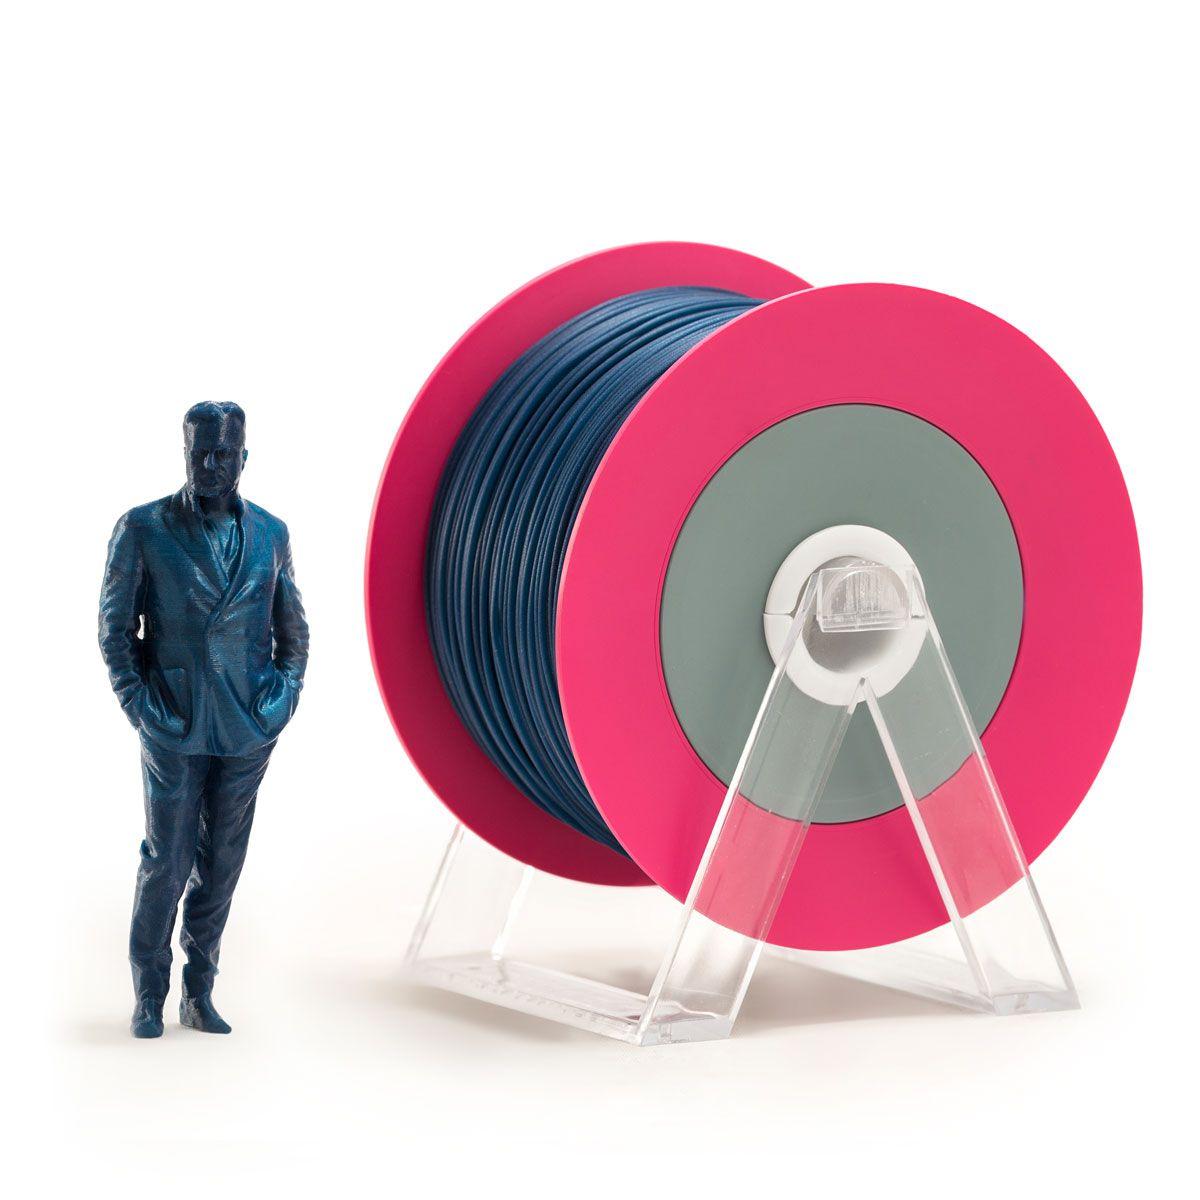 PLA Filament | Color: Glossy Blue